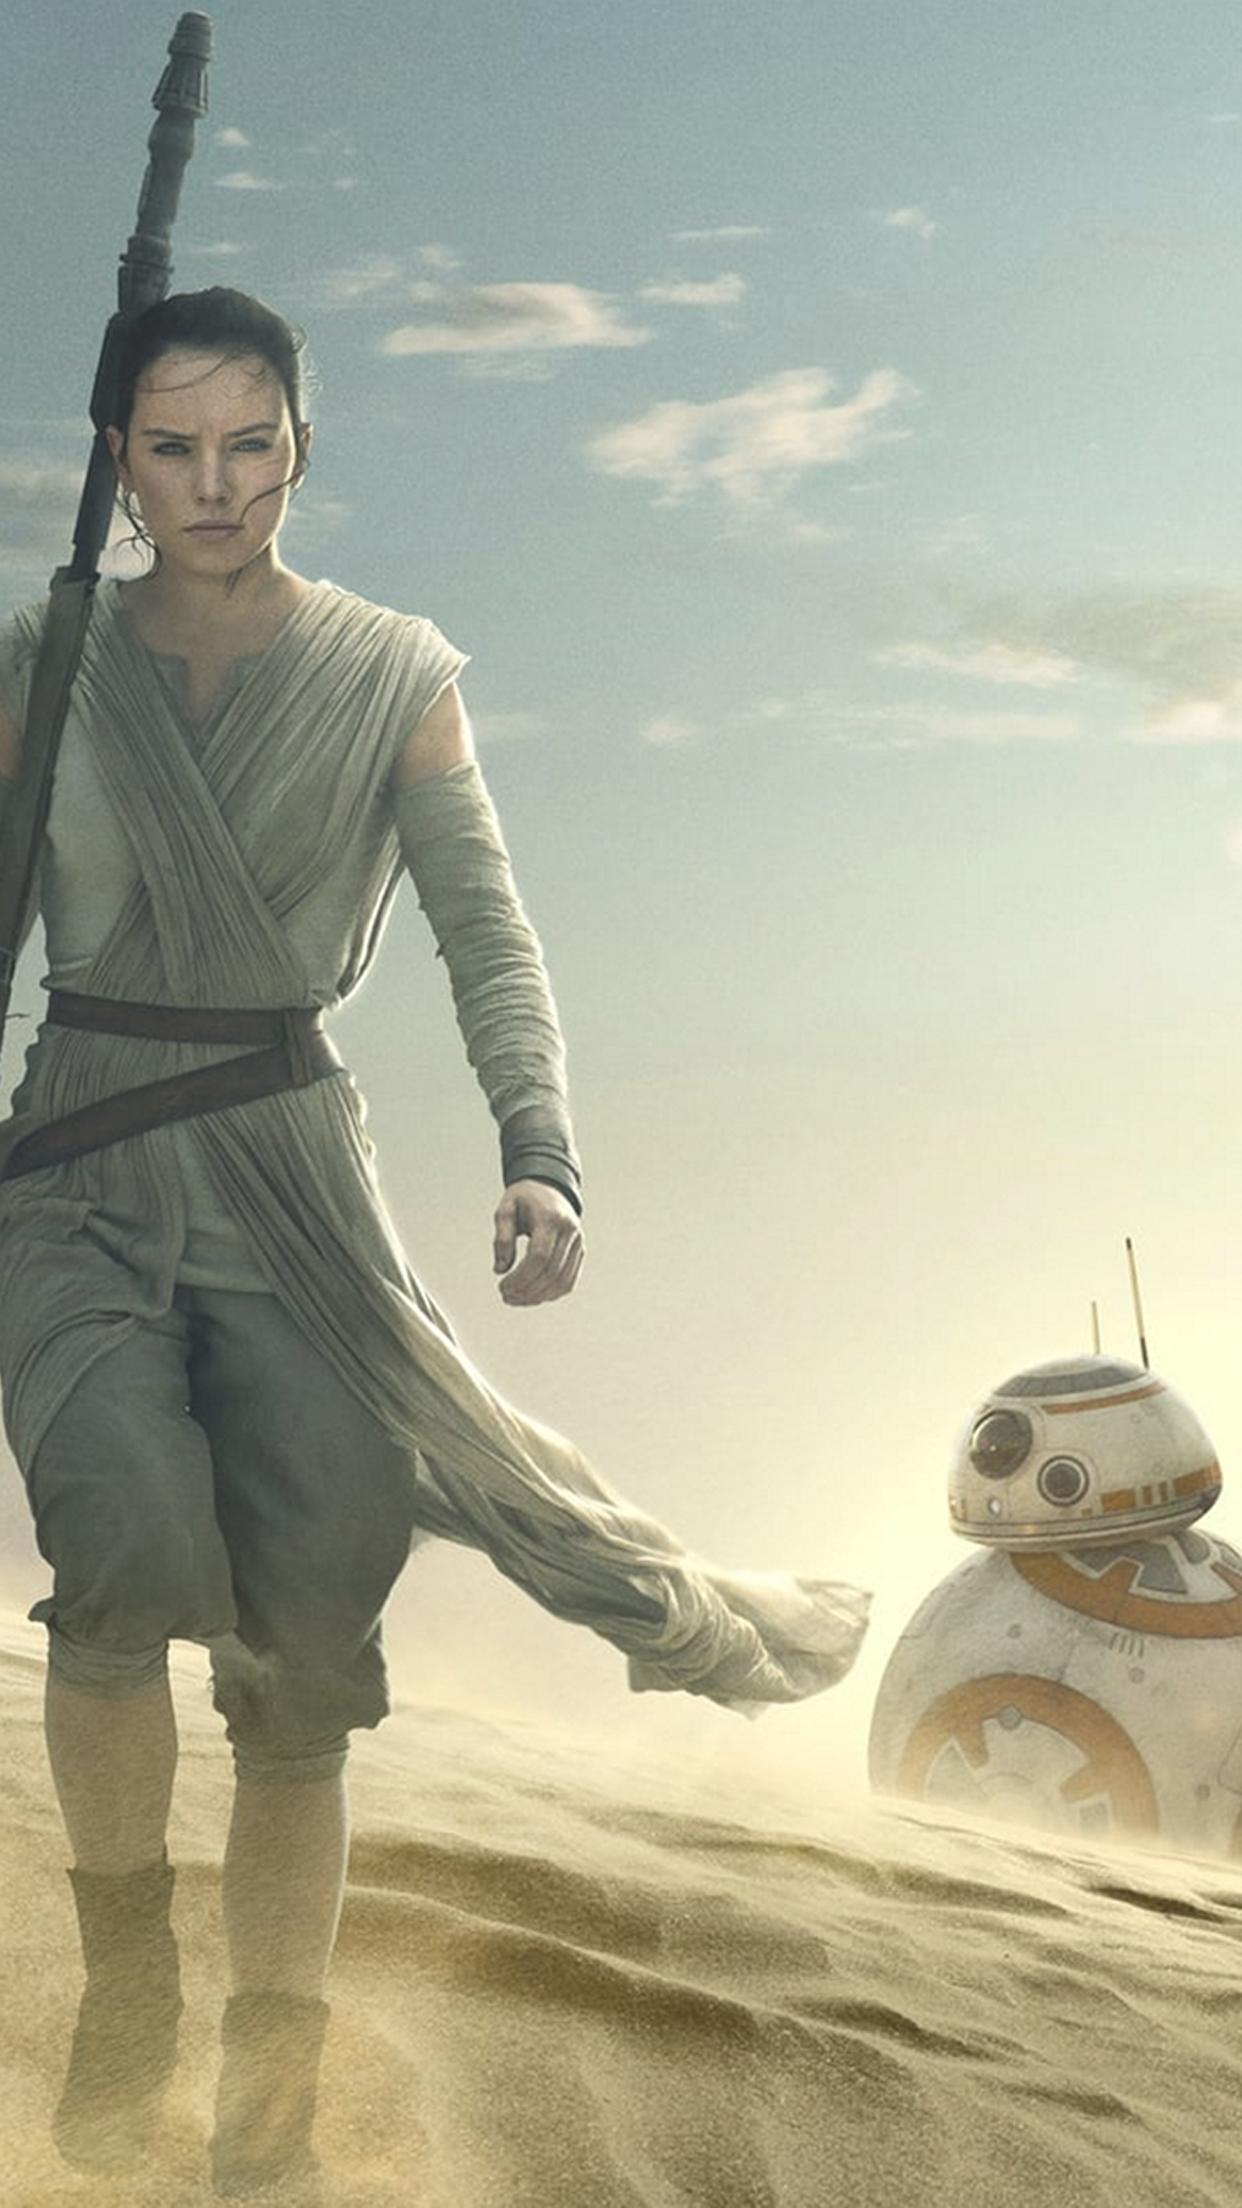 Star Wars The Force Awakens Rey Wallpaper Ideviceart Star Wars Rey Hintergrund 1242x2208 Download Hd Wallpaper Wallpapertip